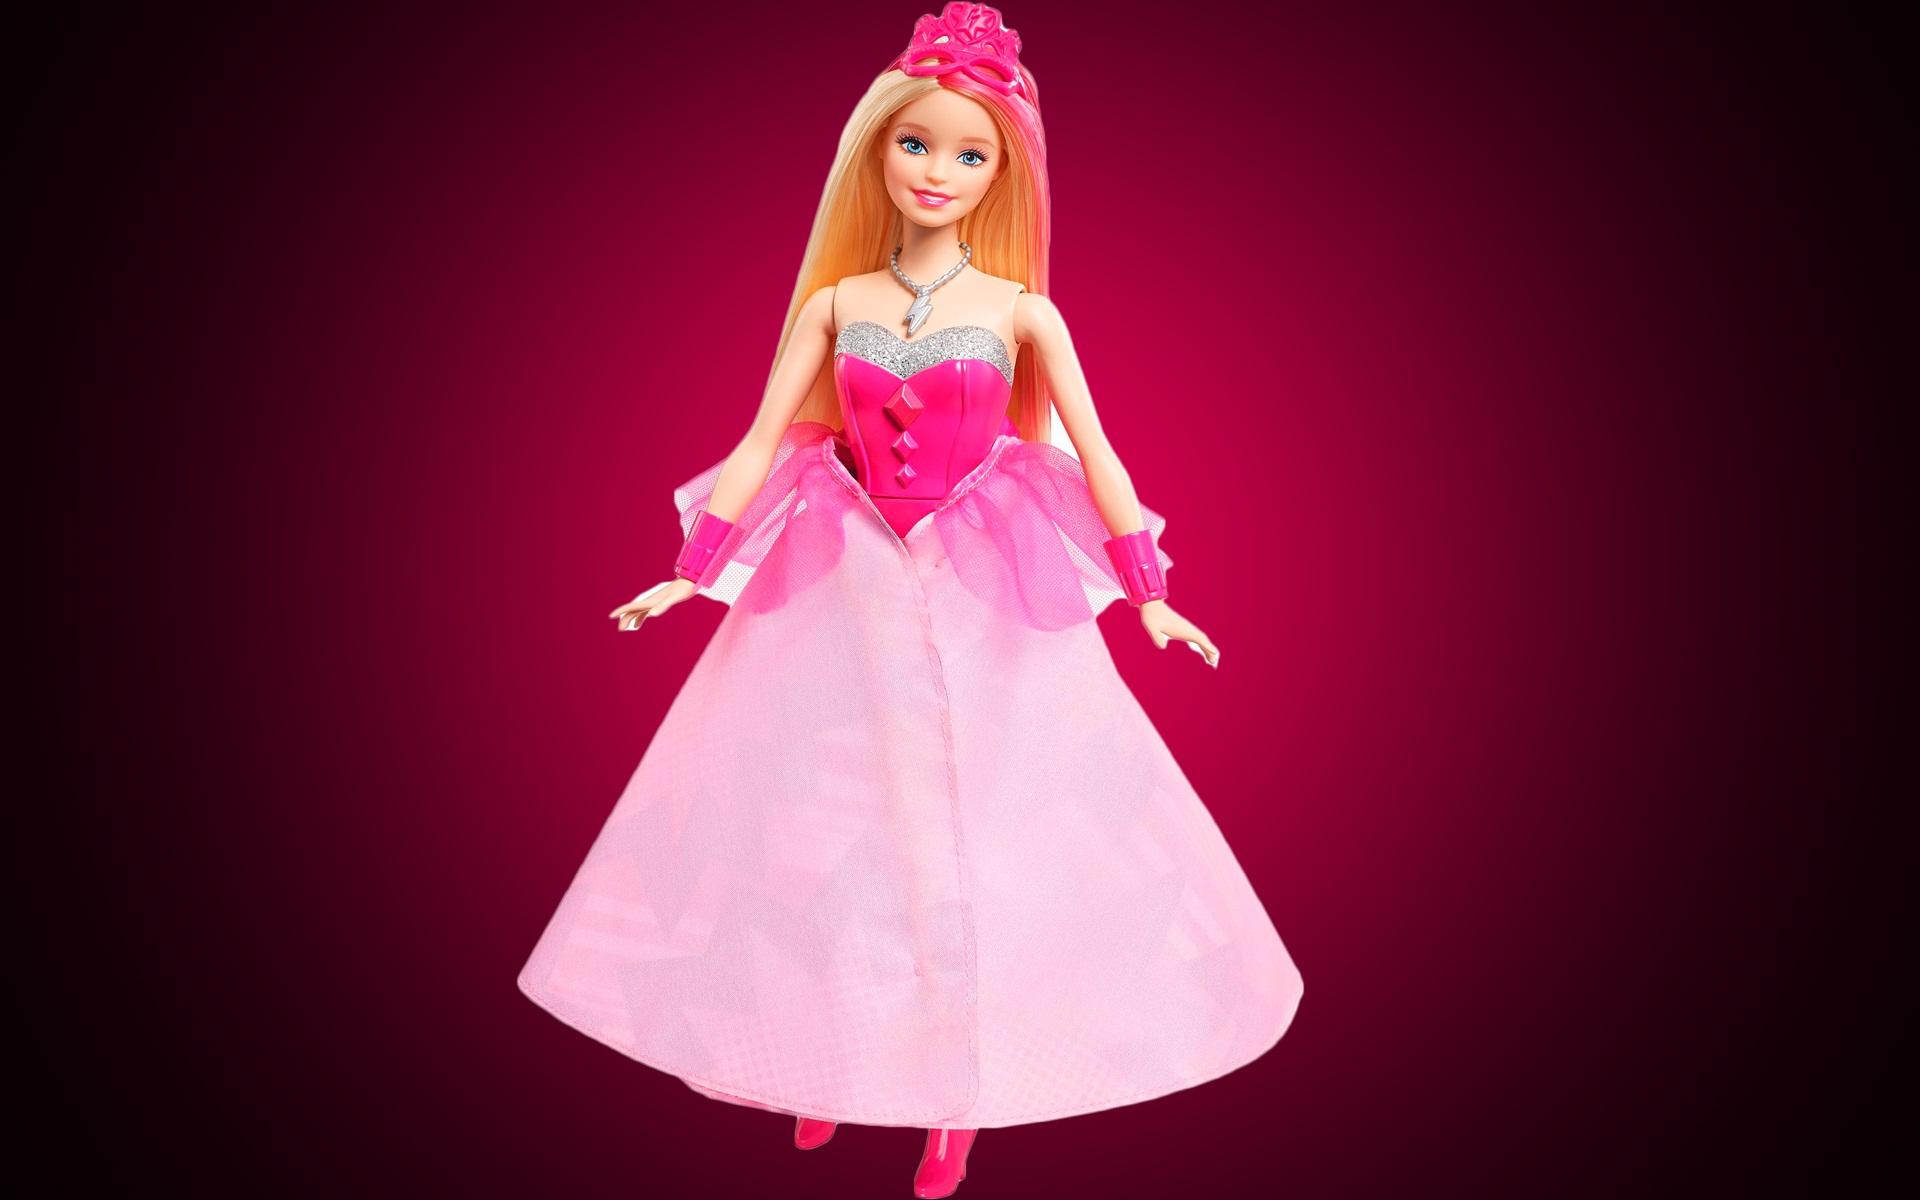 Wallpapers Download Cute Barbie Doll Barbie Doll Wallpapers 32 Wallpapers Adorable Wallpapers